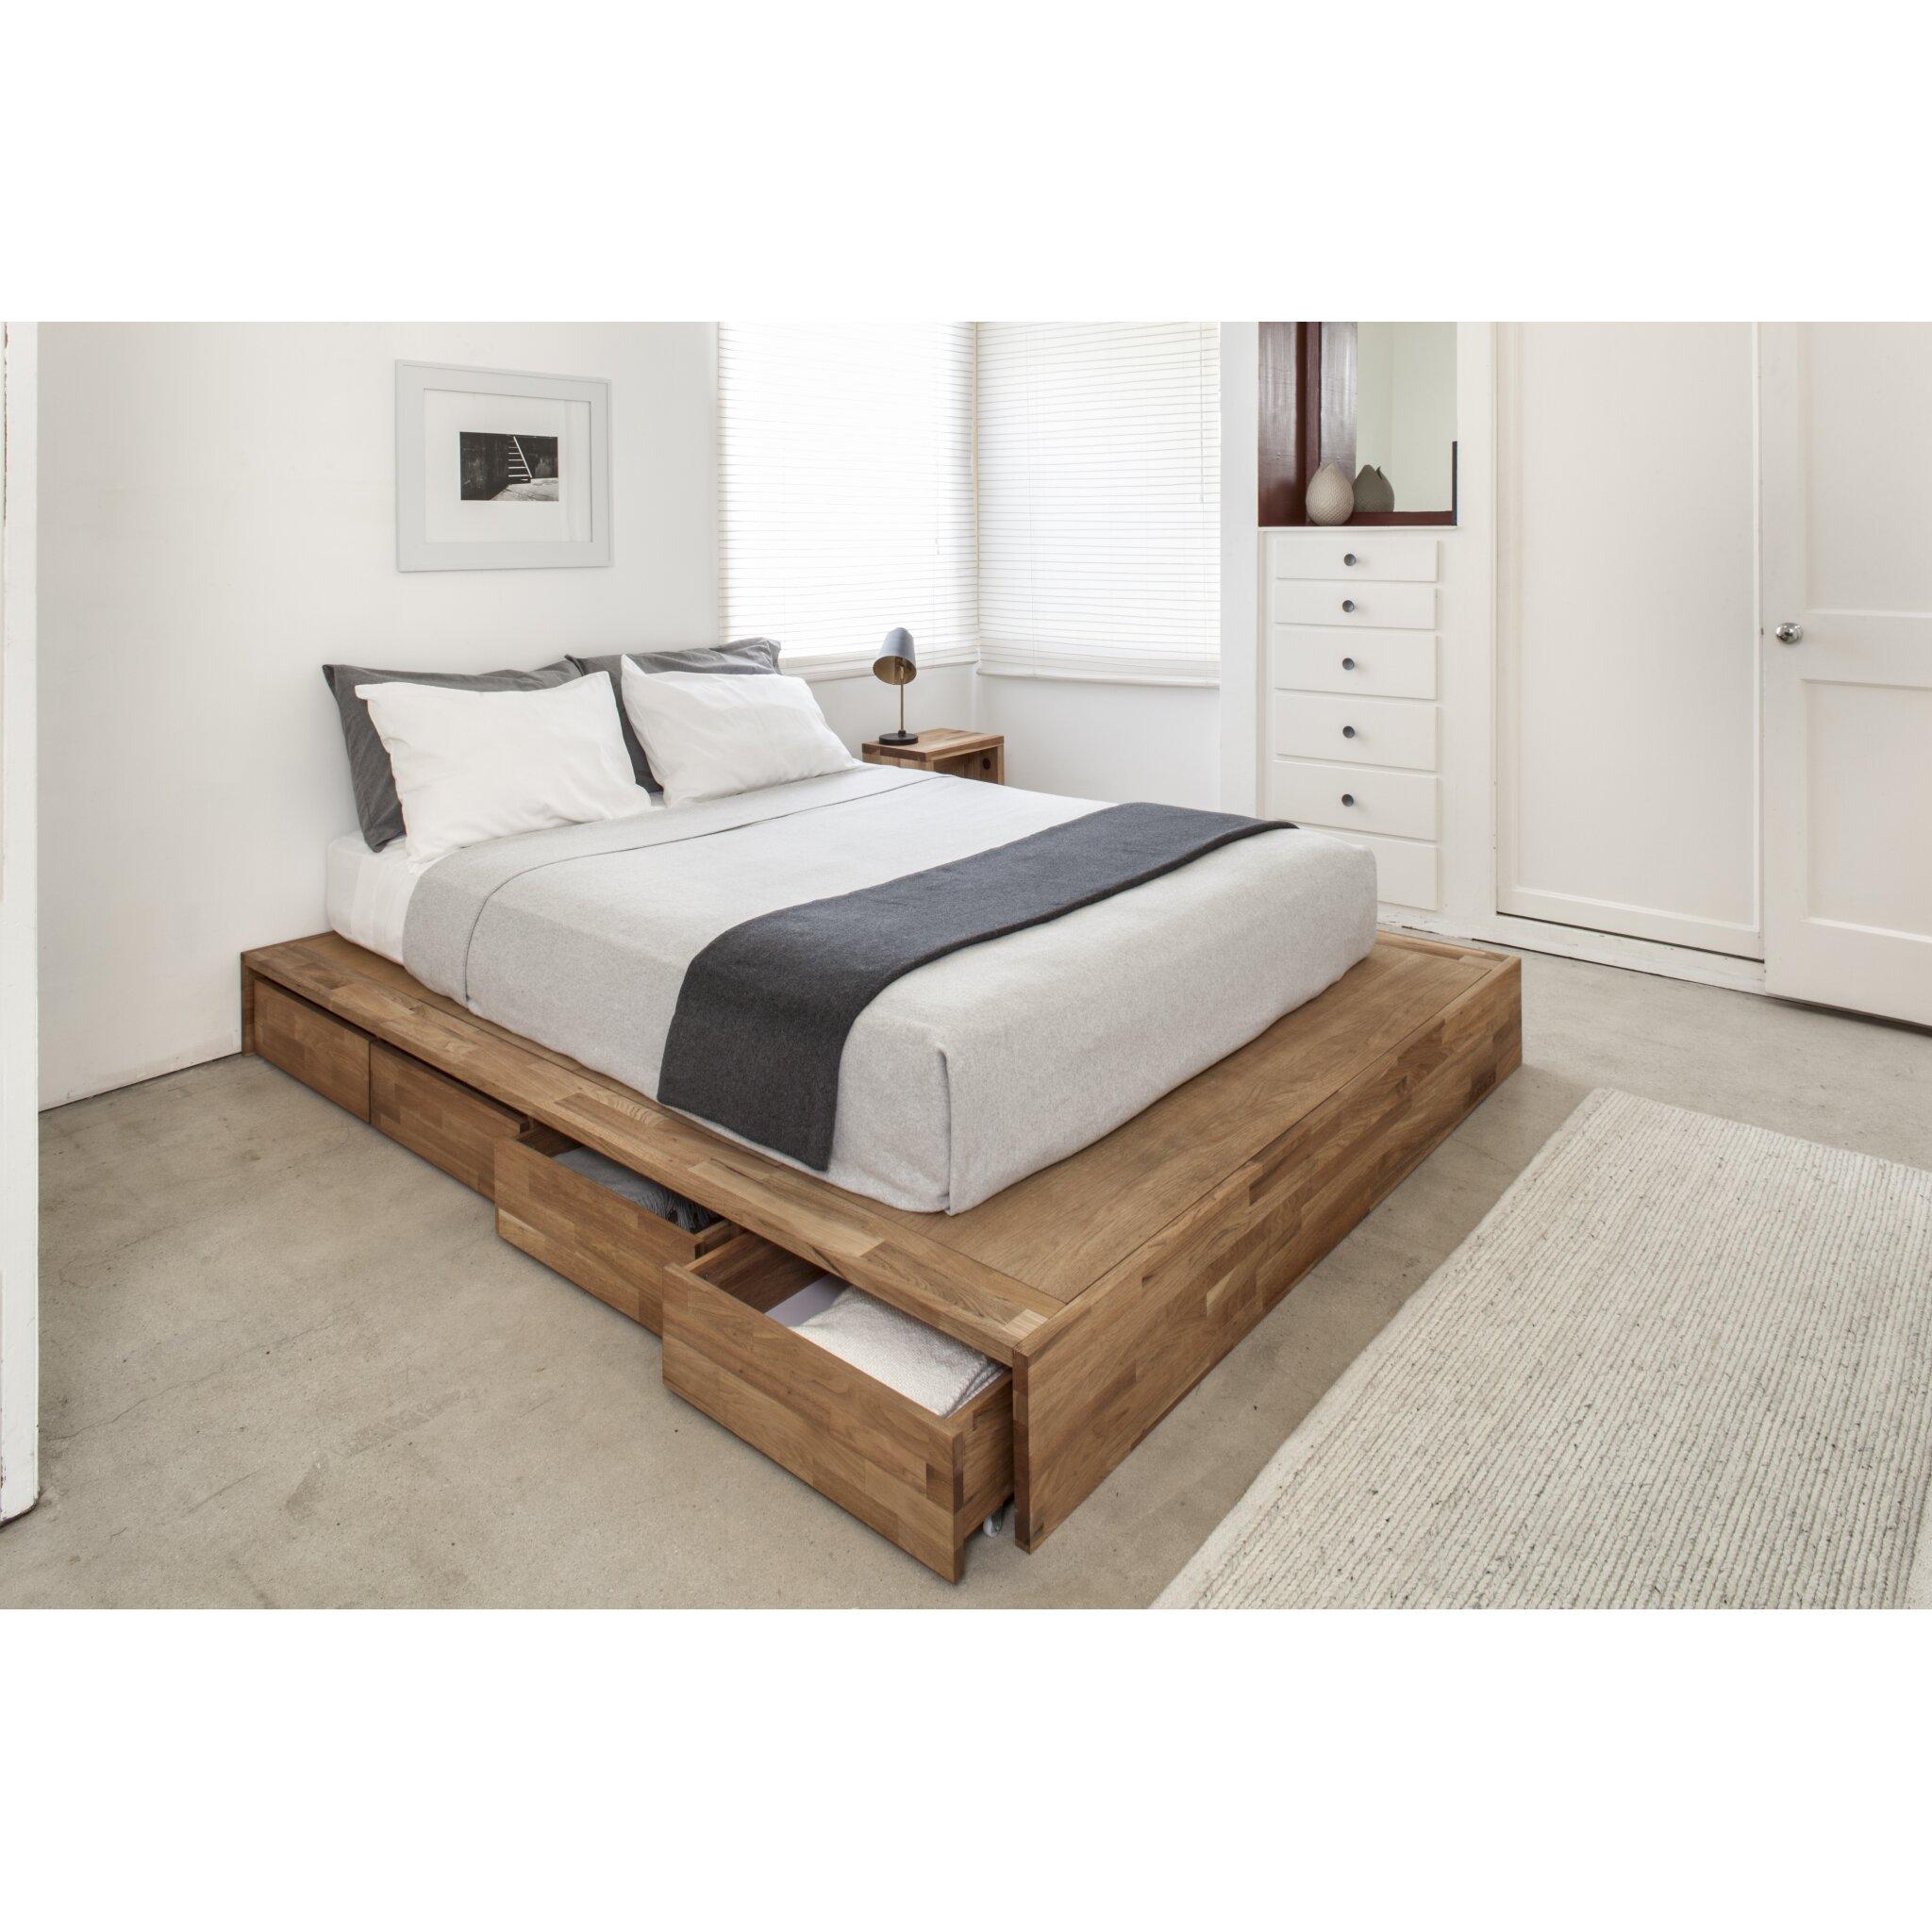 Lax Series Storage Platform Bed By Mash Studios